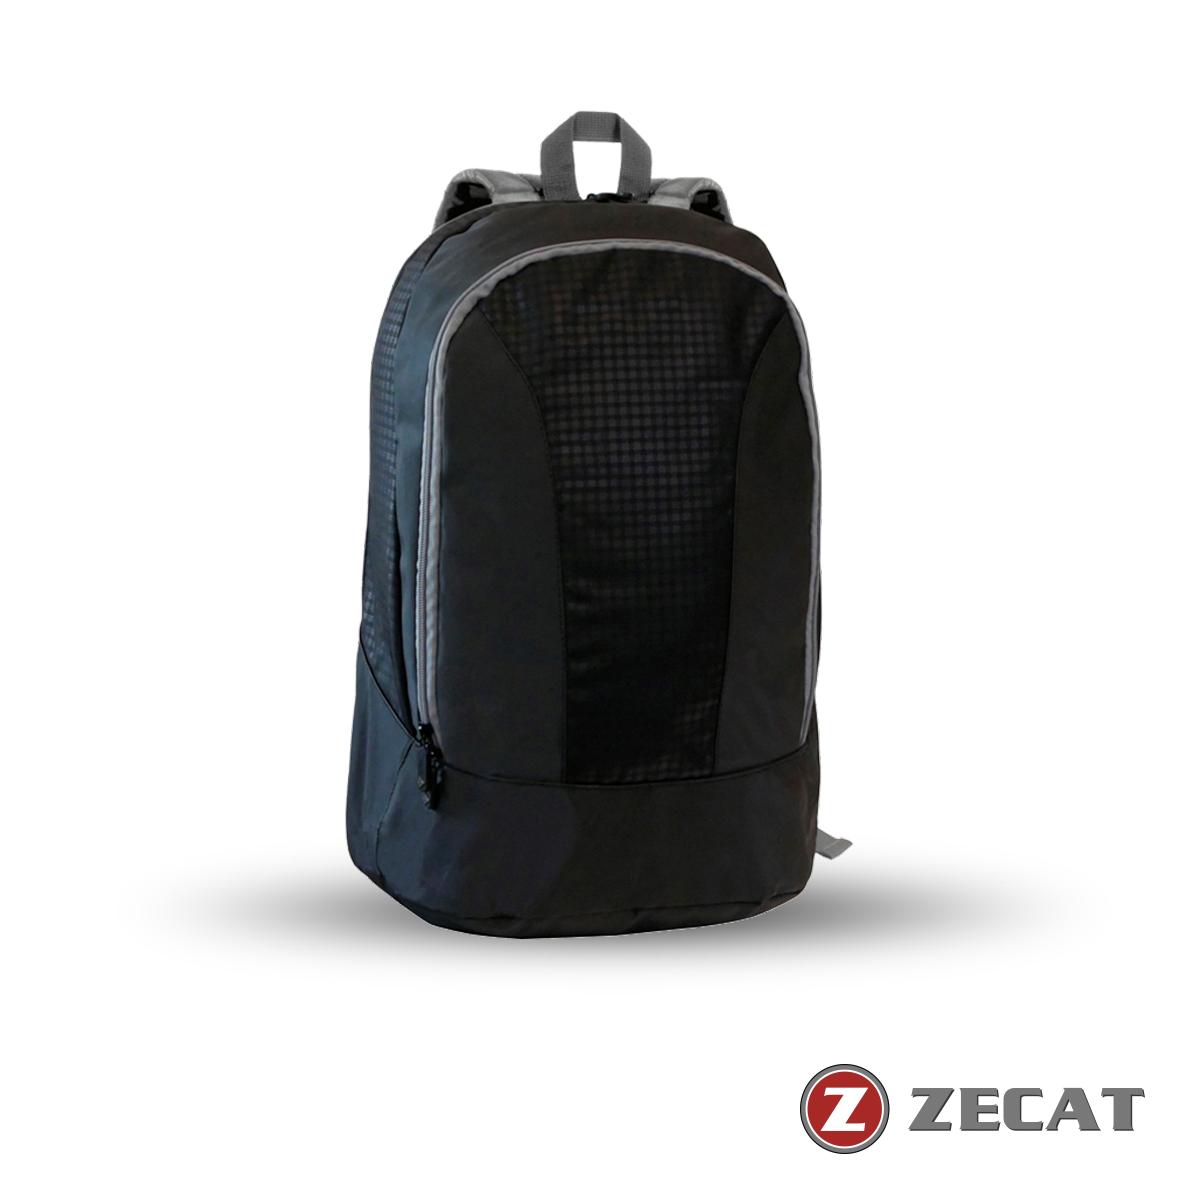 Backpack - Swissbags